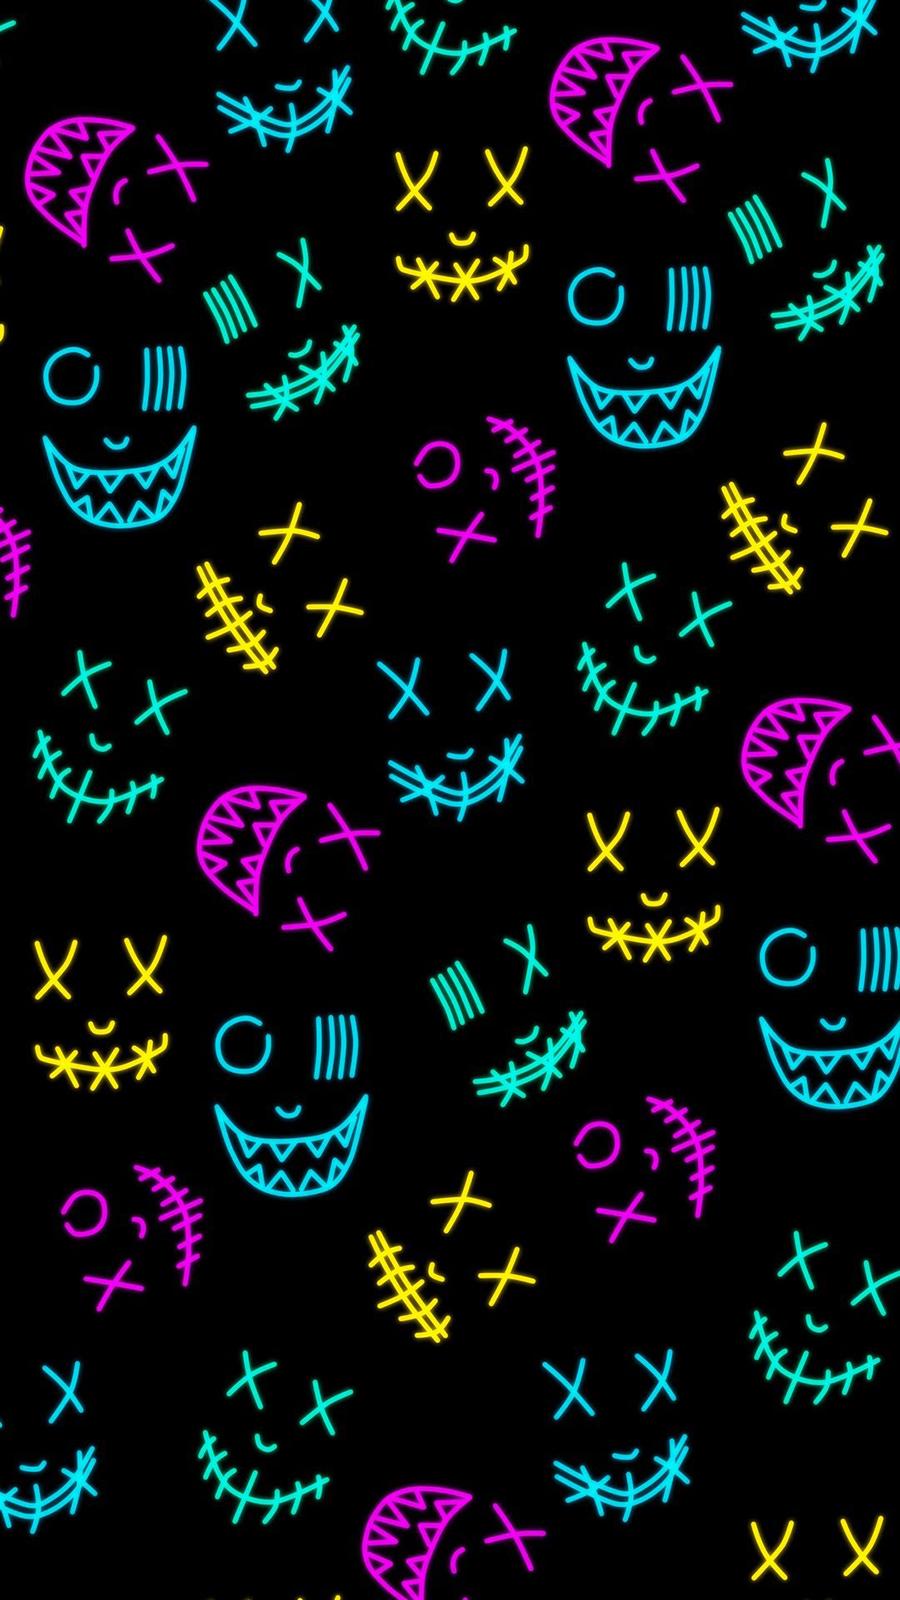 Neon Smile Wallpapers – Smile Wallpaper Free Download